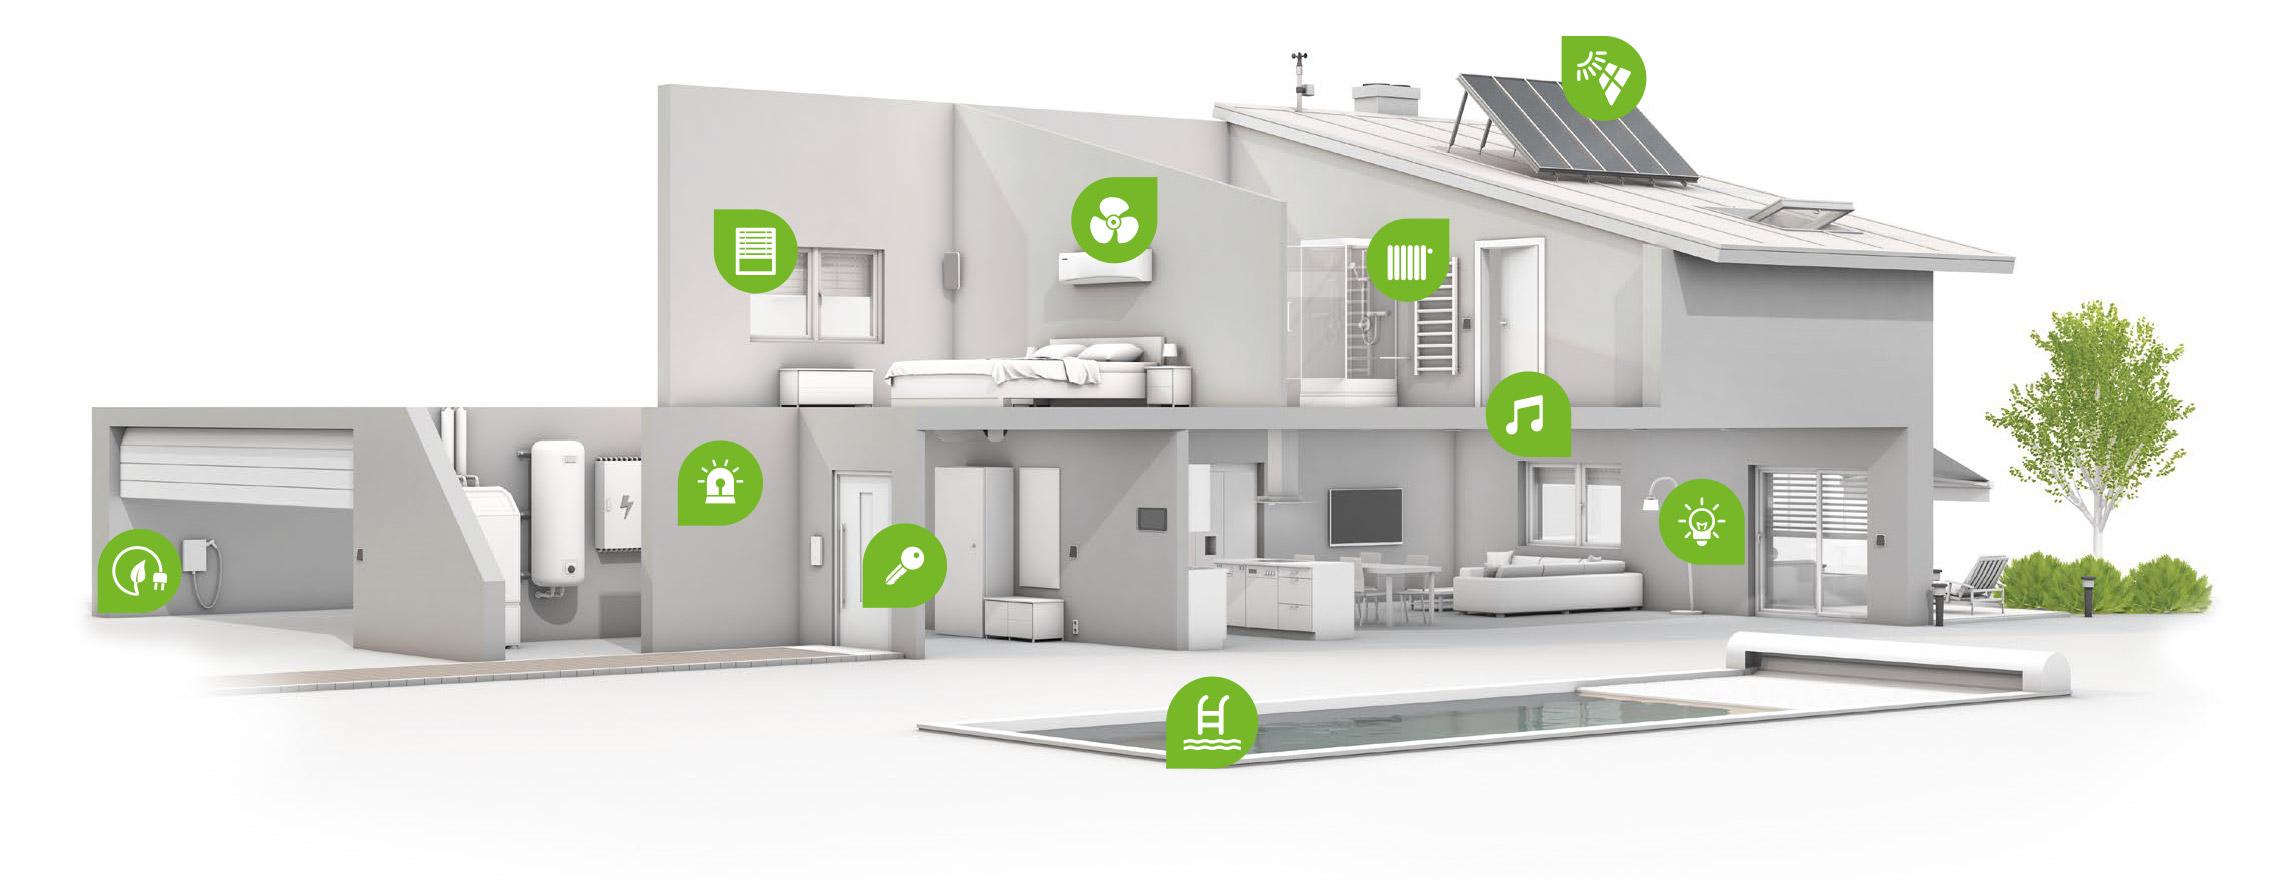 Infografika: smarthome technologie v chytré domácnosti